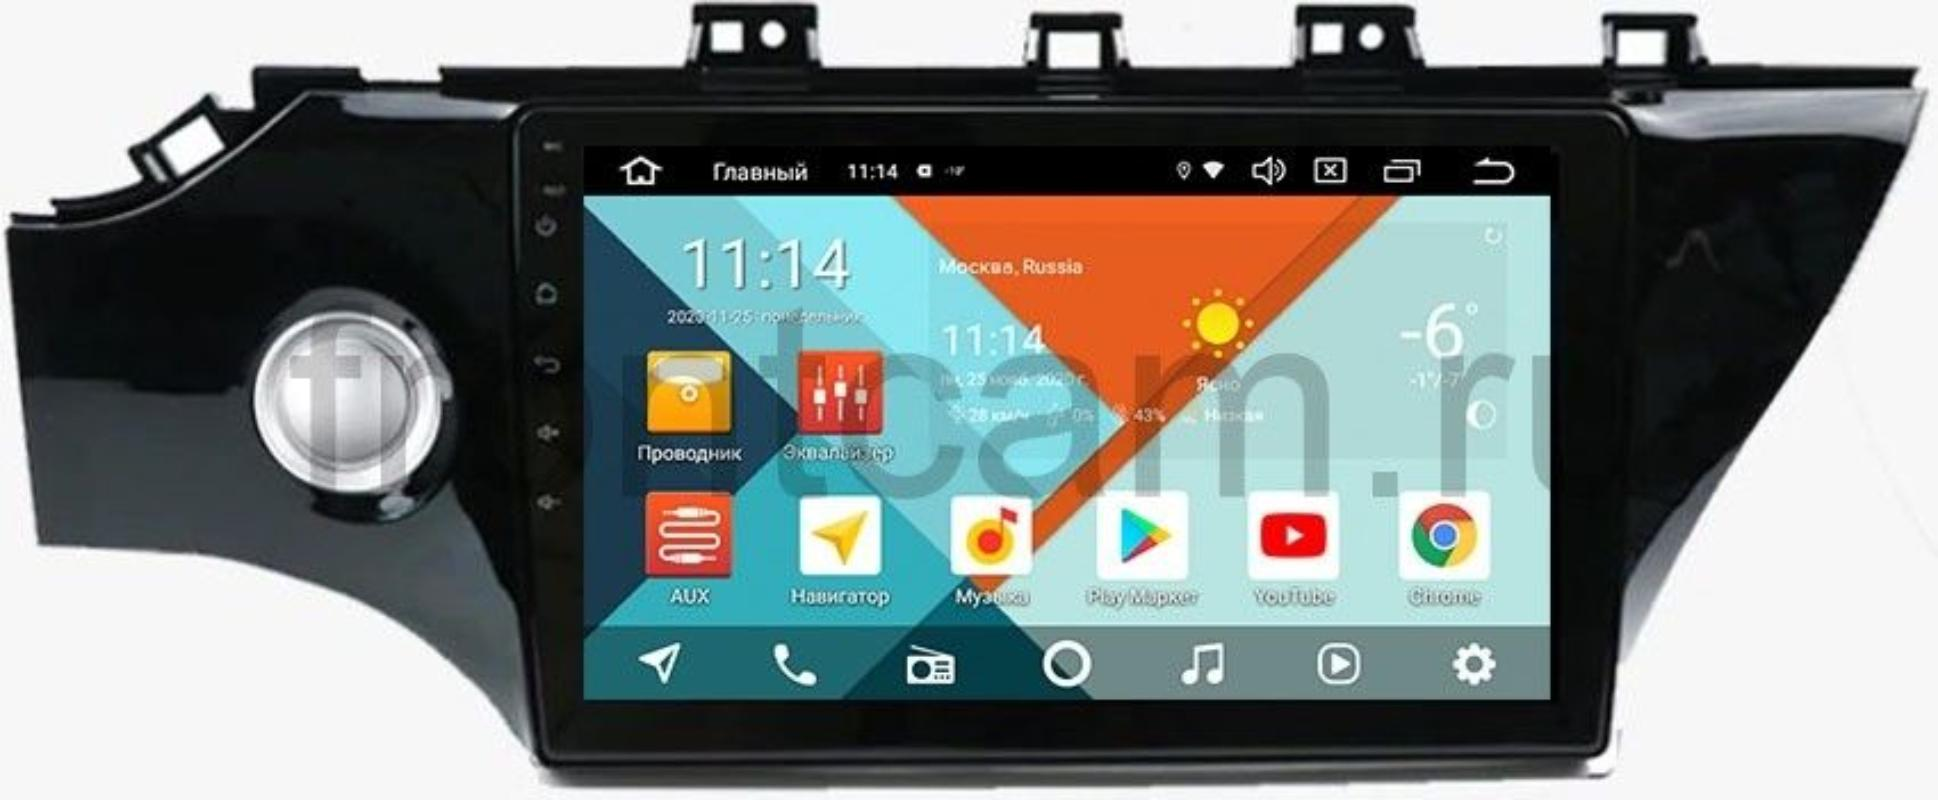 Штатная магнитола Kia Rio IV, Rio IV X-Line (с кнопкой) Wide Media KS10-419QR-3/32 DSP CarPlay 4G-SIM на Android 10 (+ Камера заднего вида в подарок!)